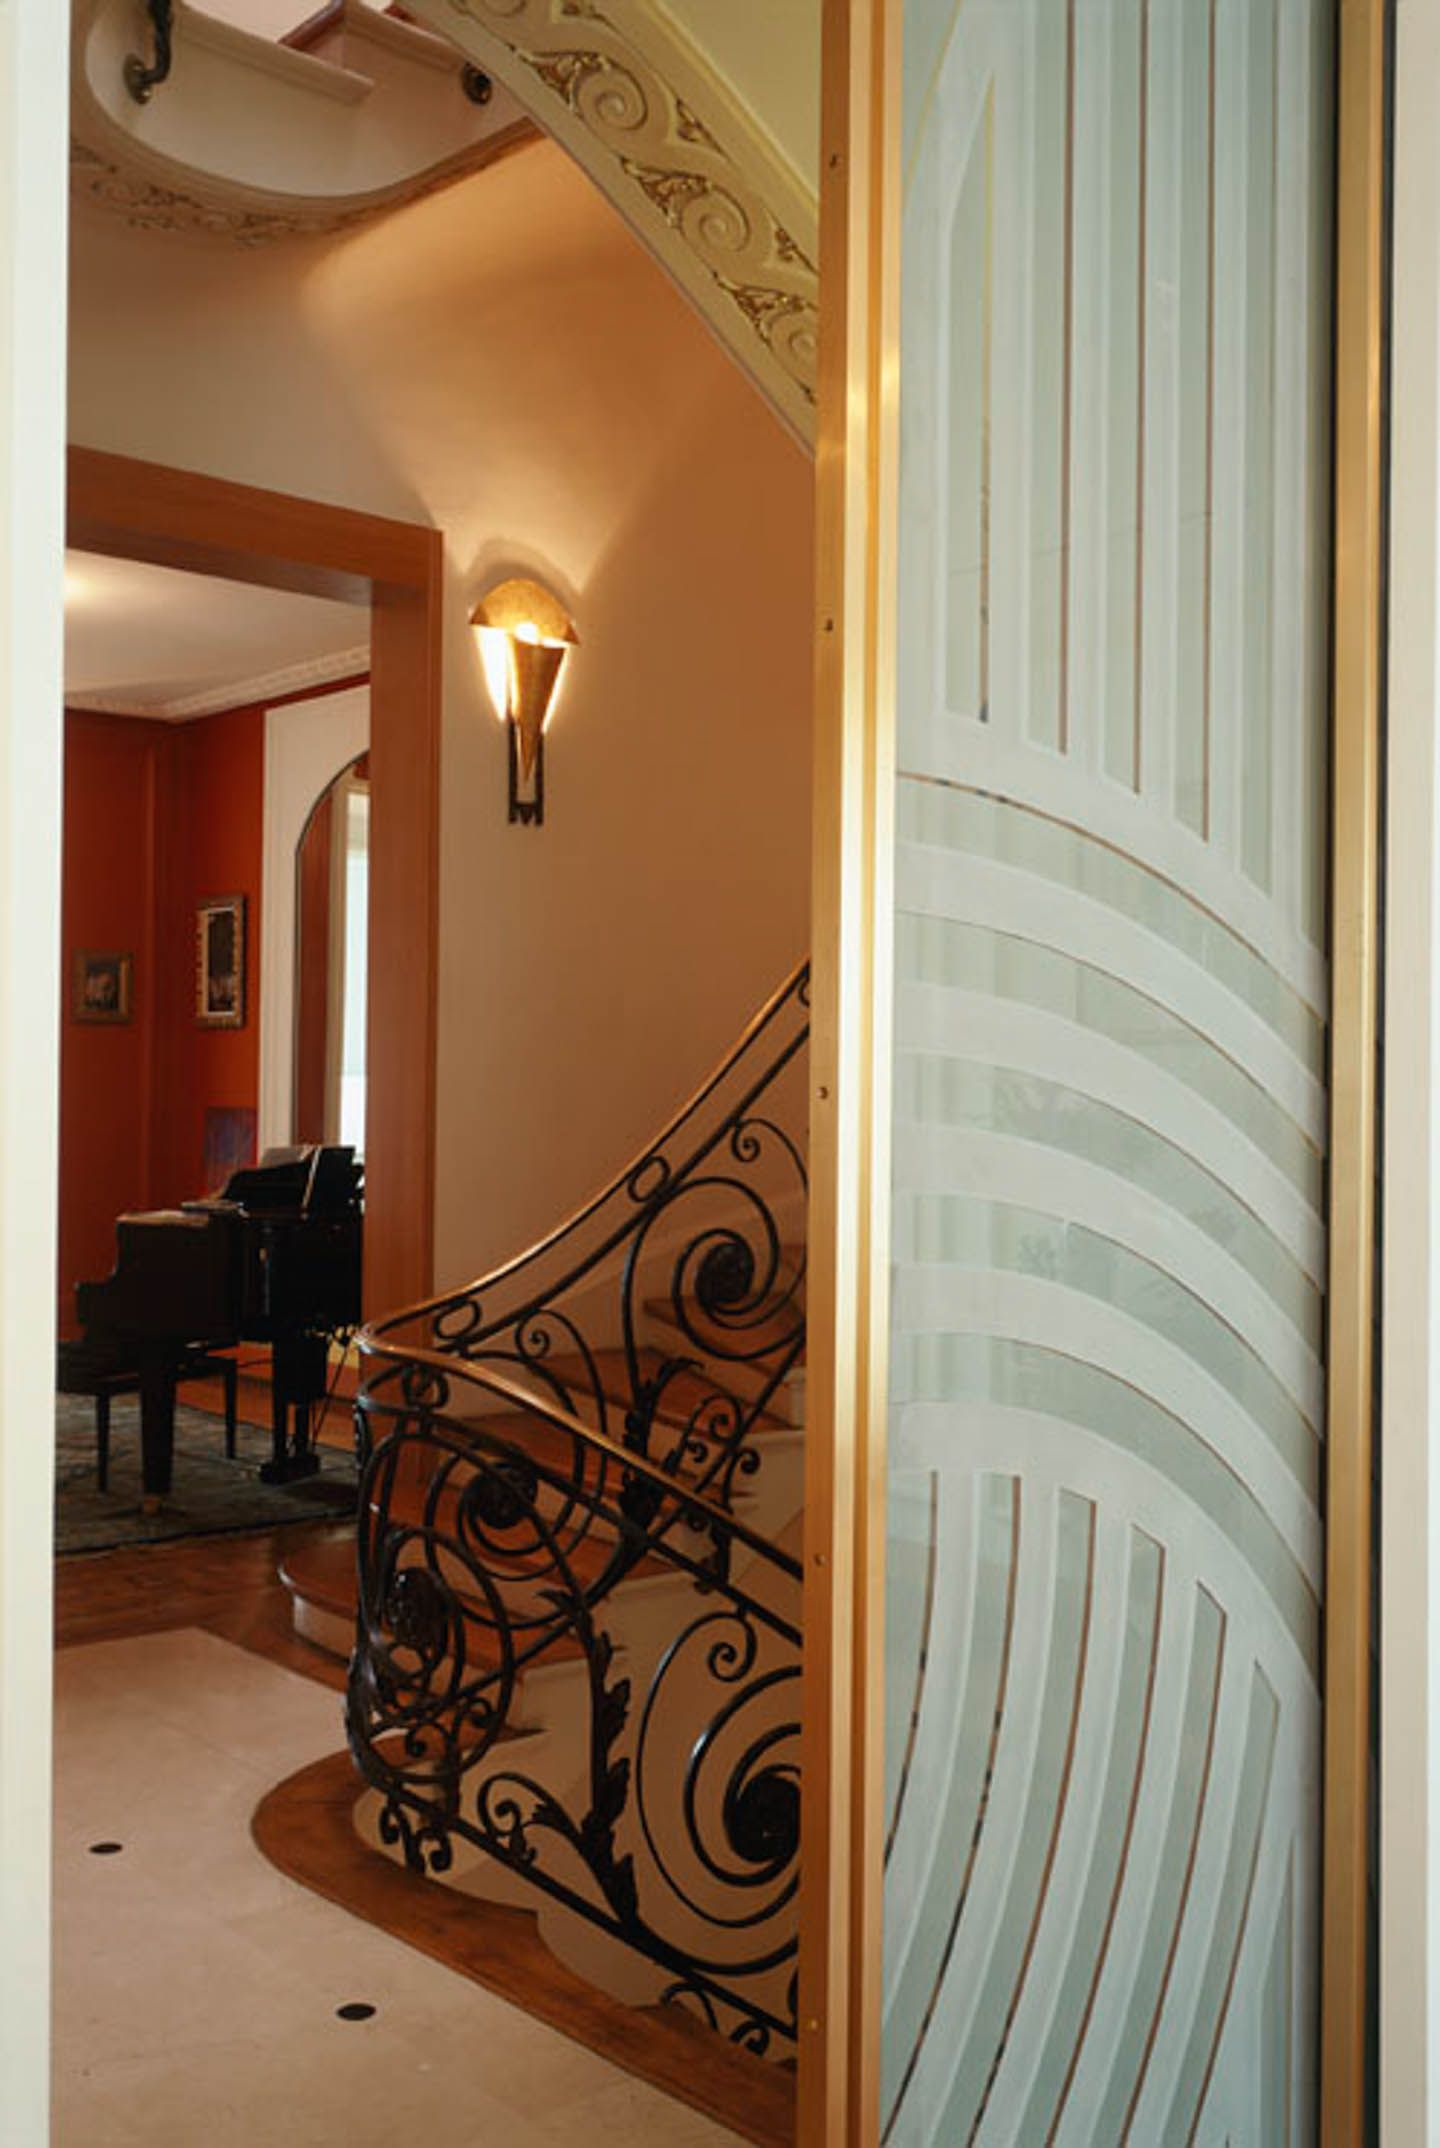 Paris Hotel Particulier